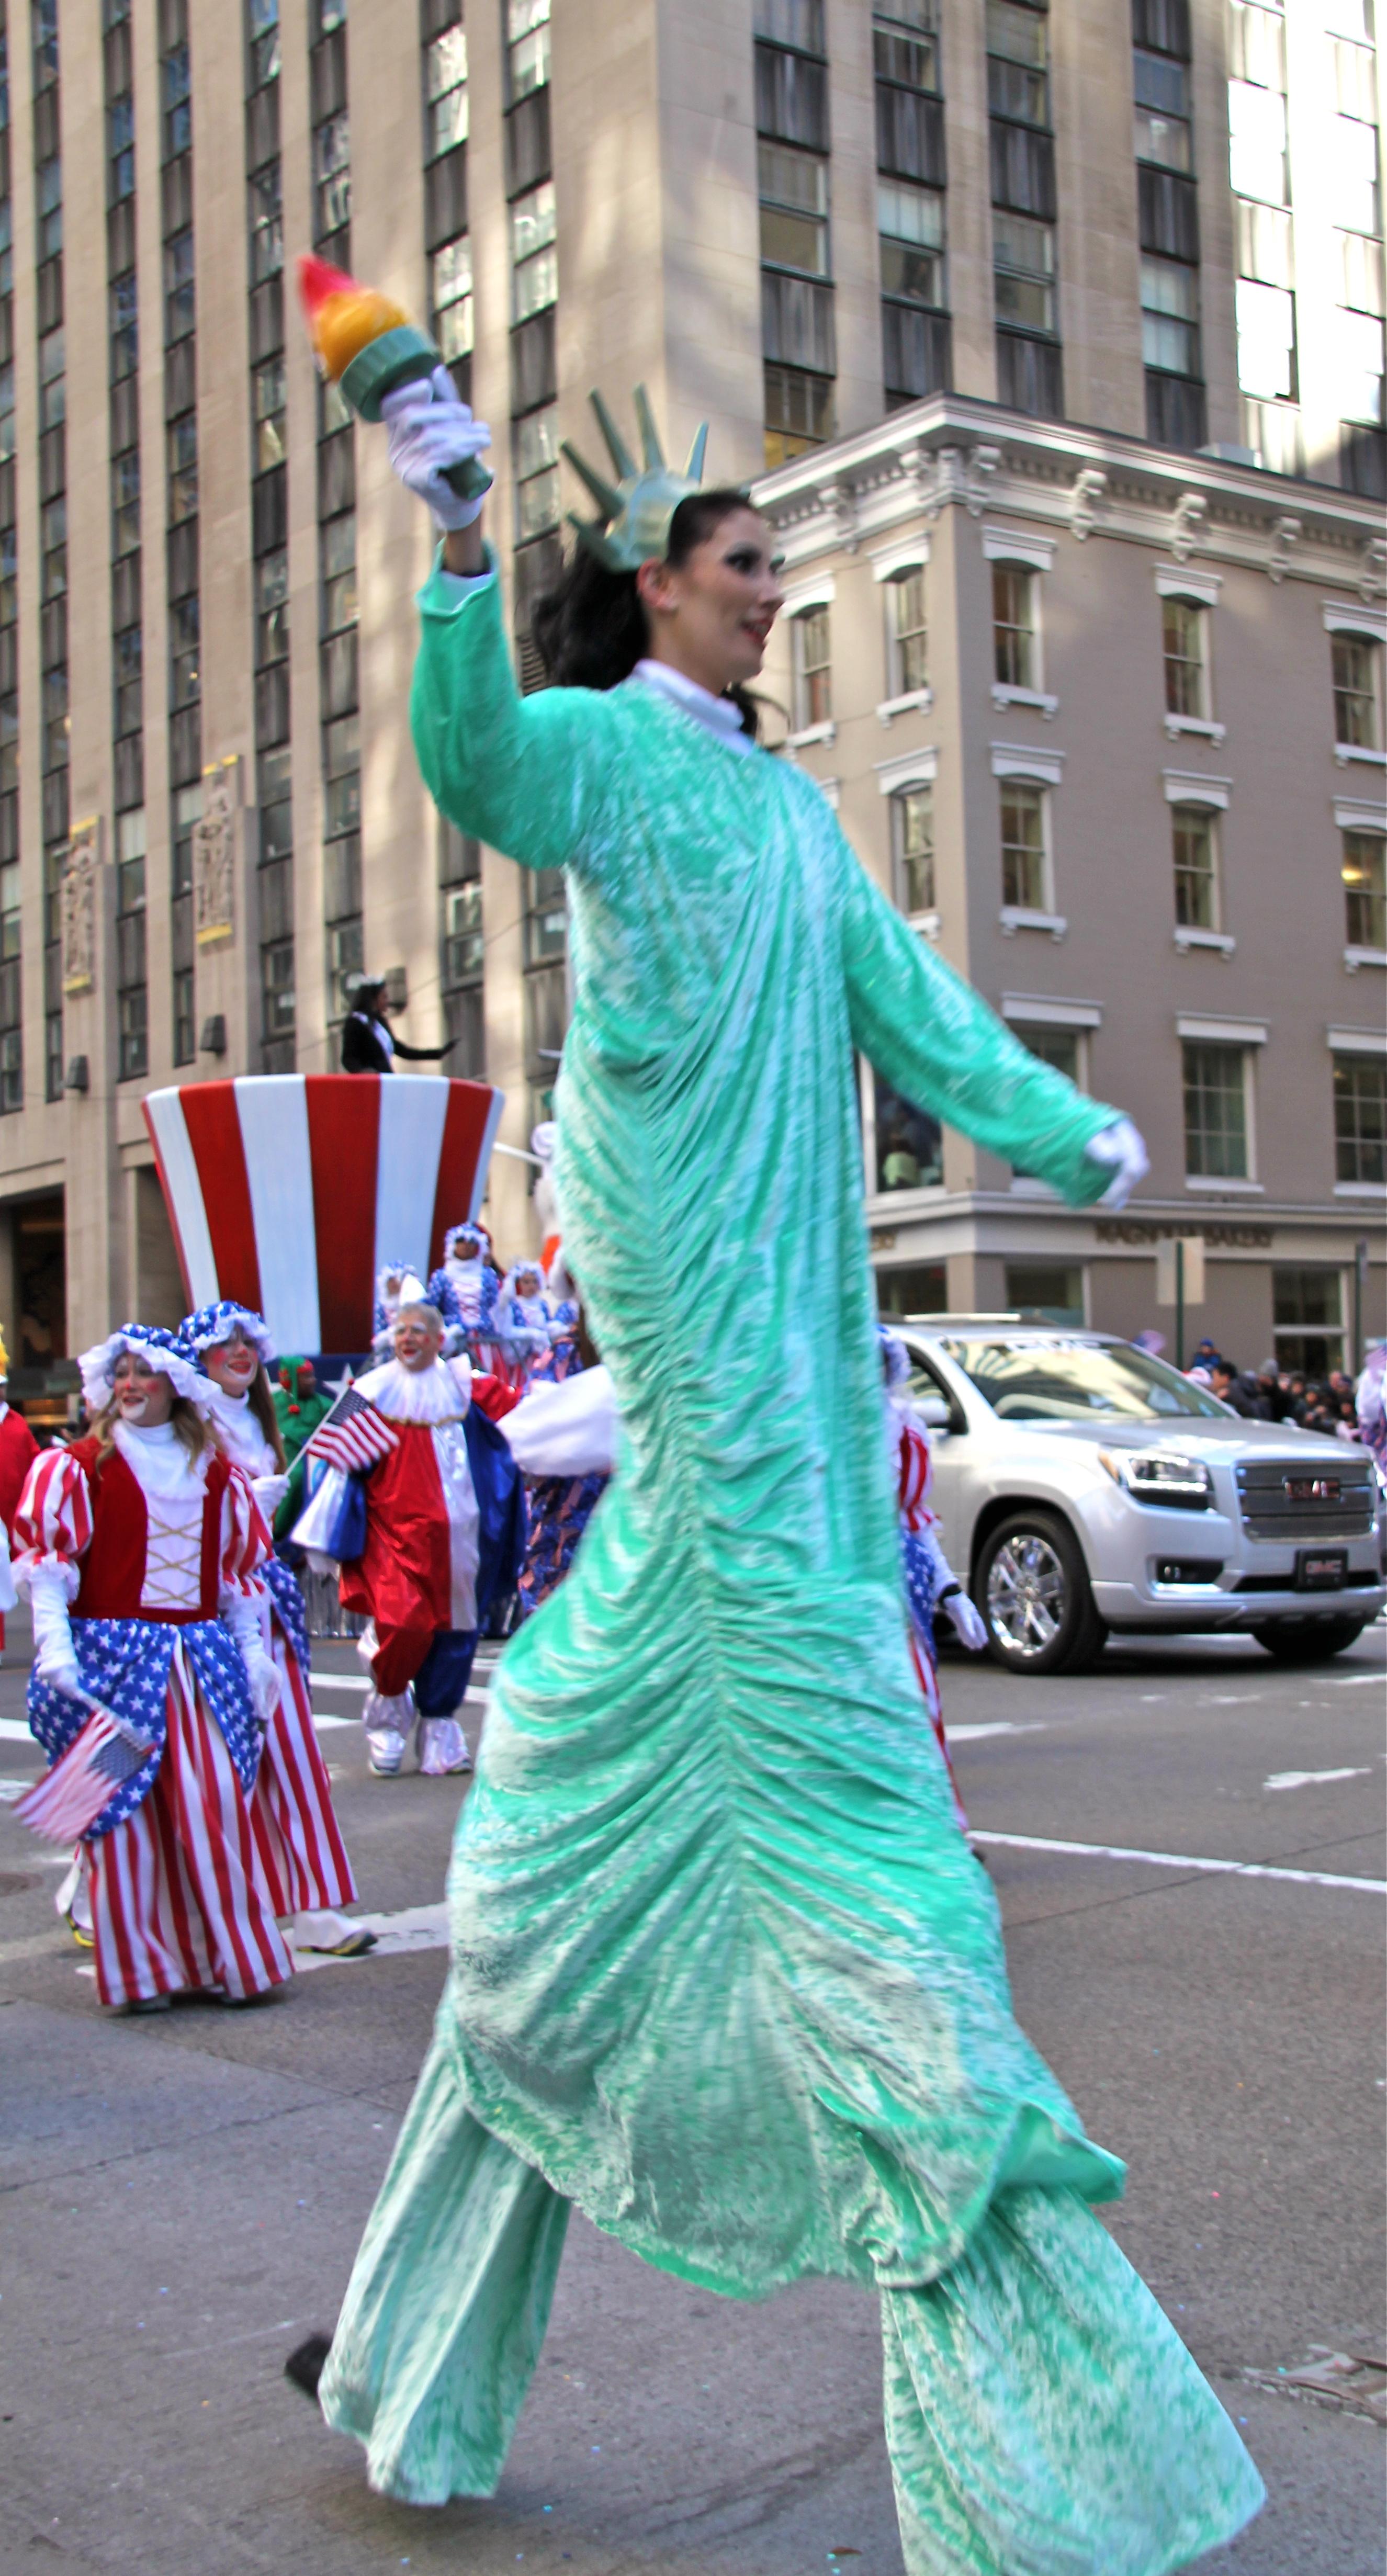 statue of liberty bmore energy